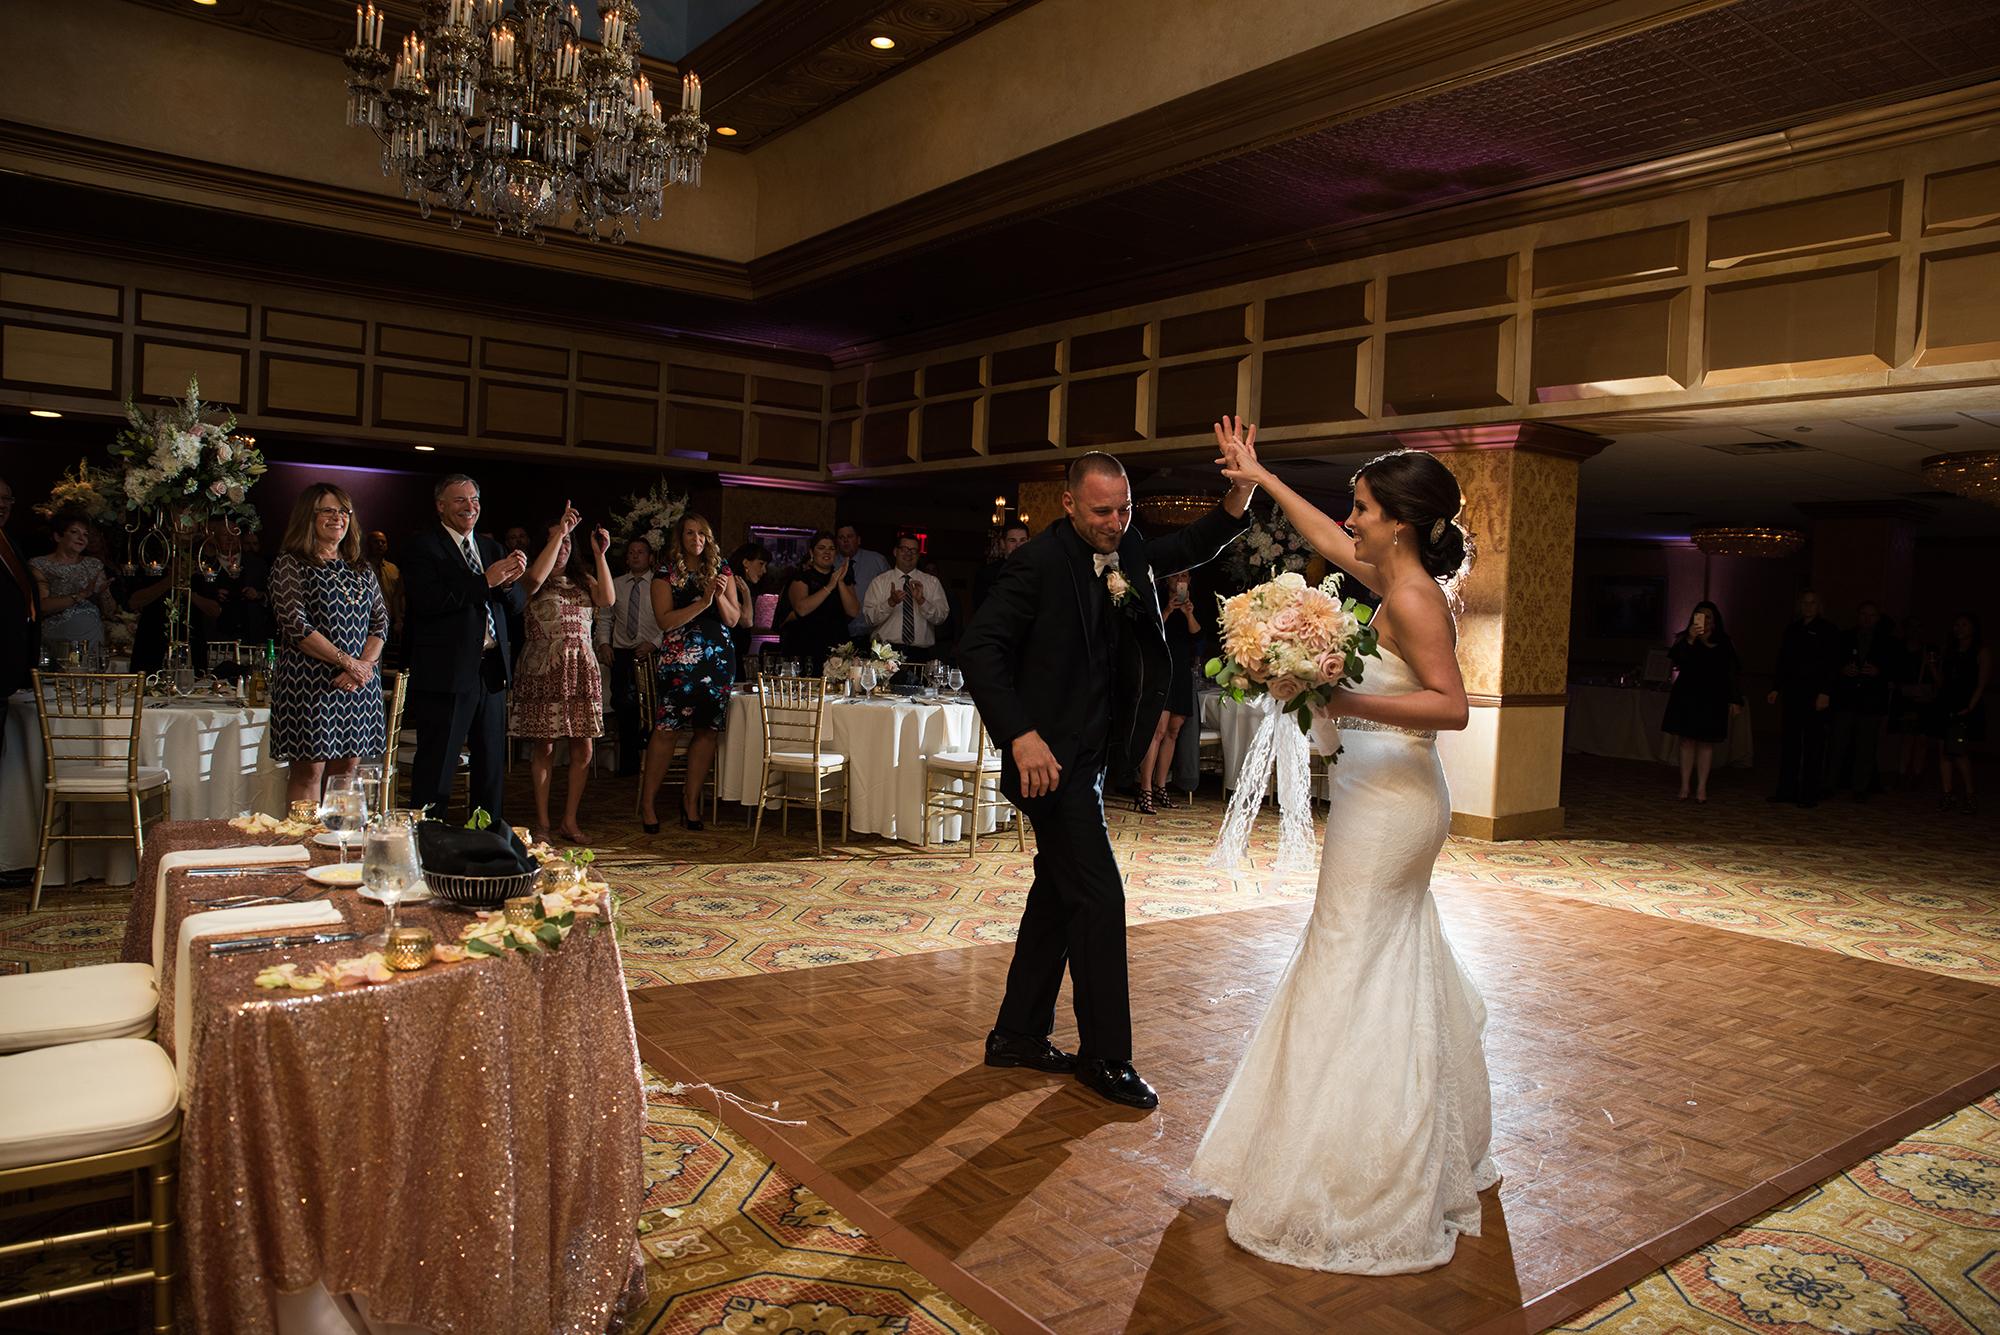 lbi-photographer-ac-wedding-claridge-val-26.jpg